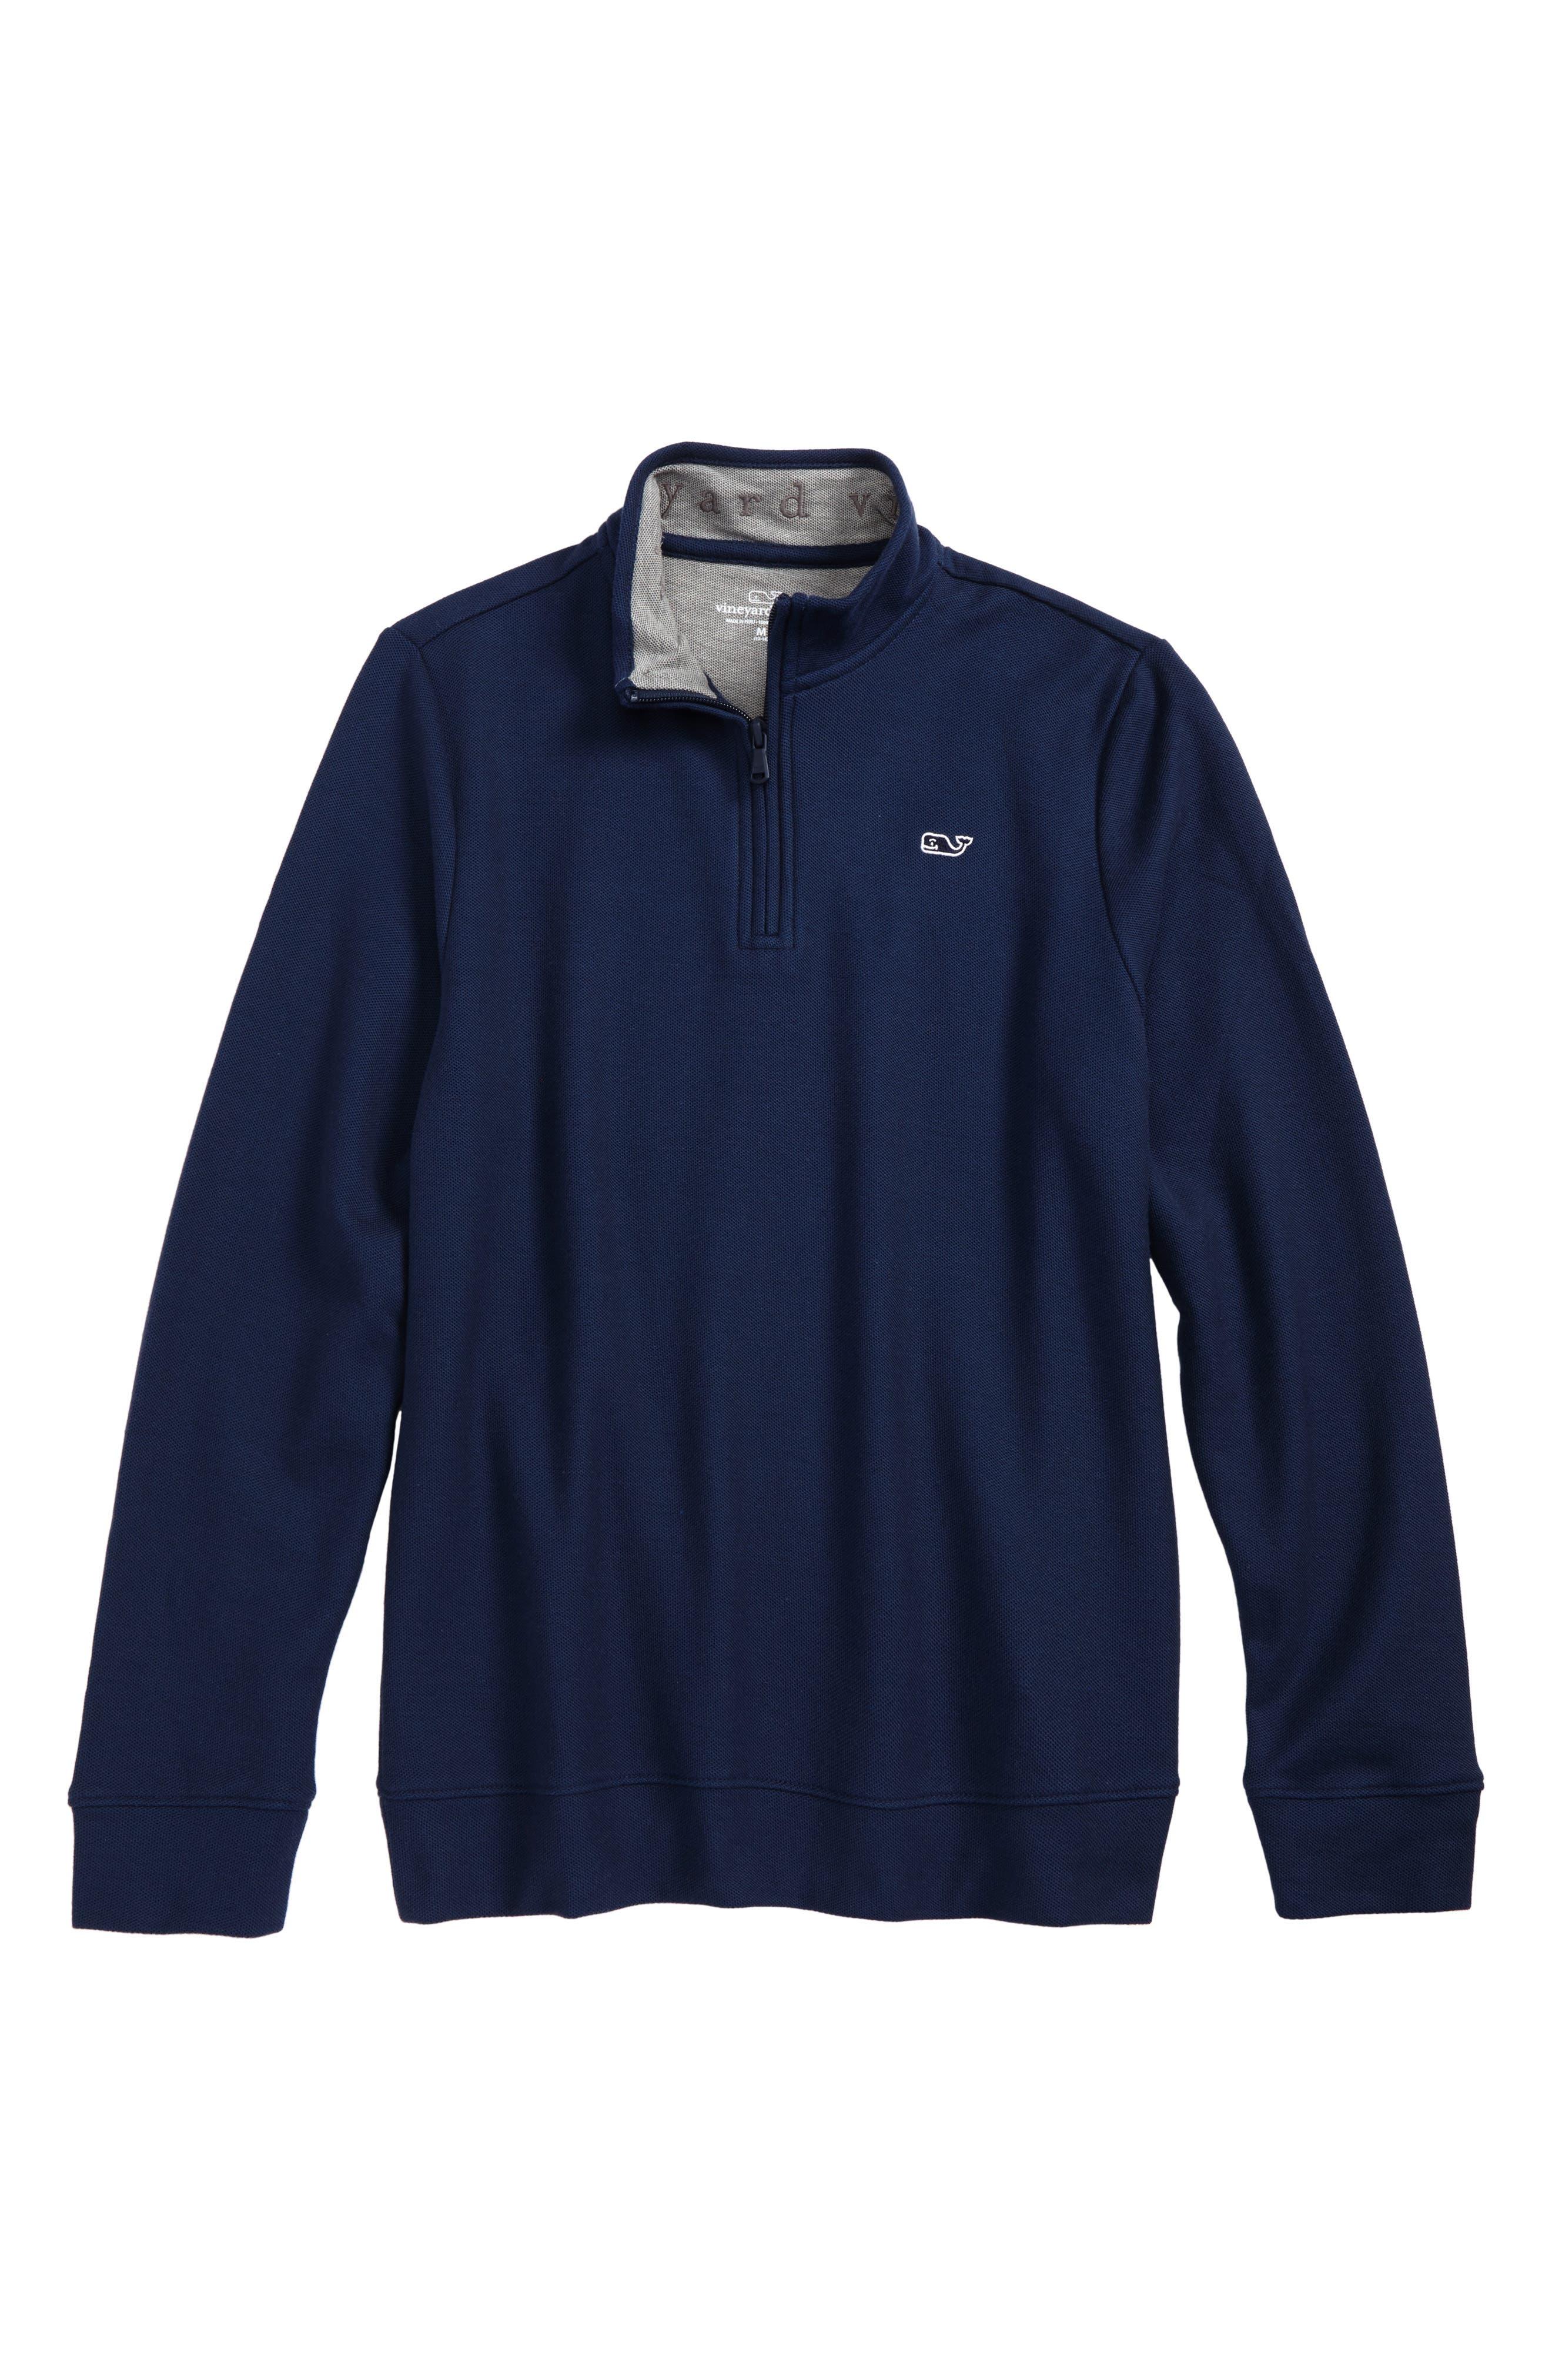 Quarter Zip Pullover,                         Main,                         color, VINEYARD NAVY